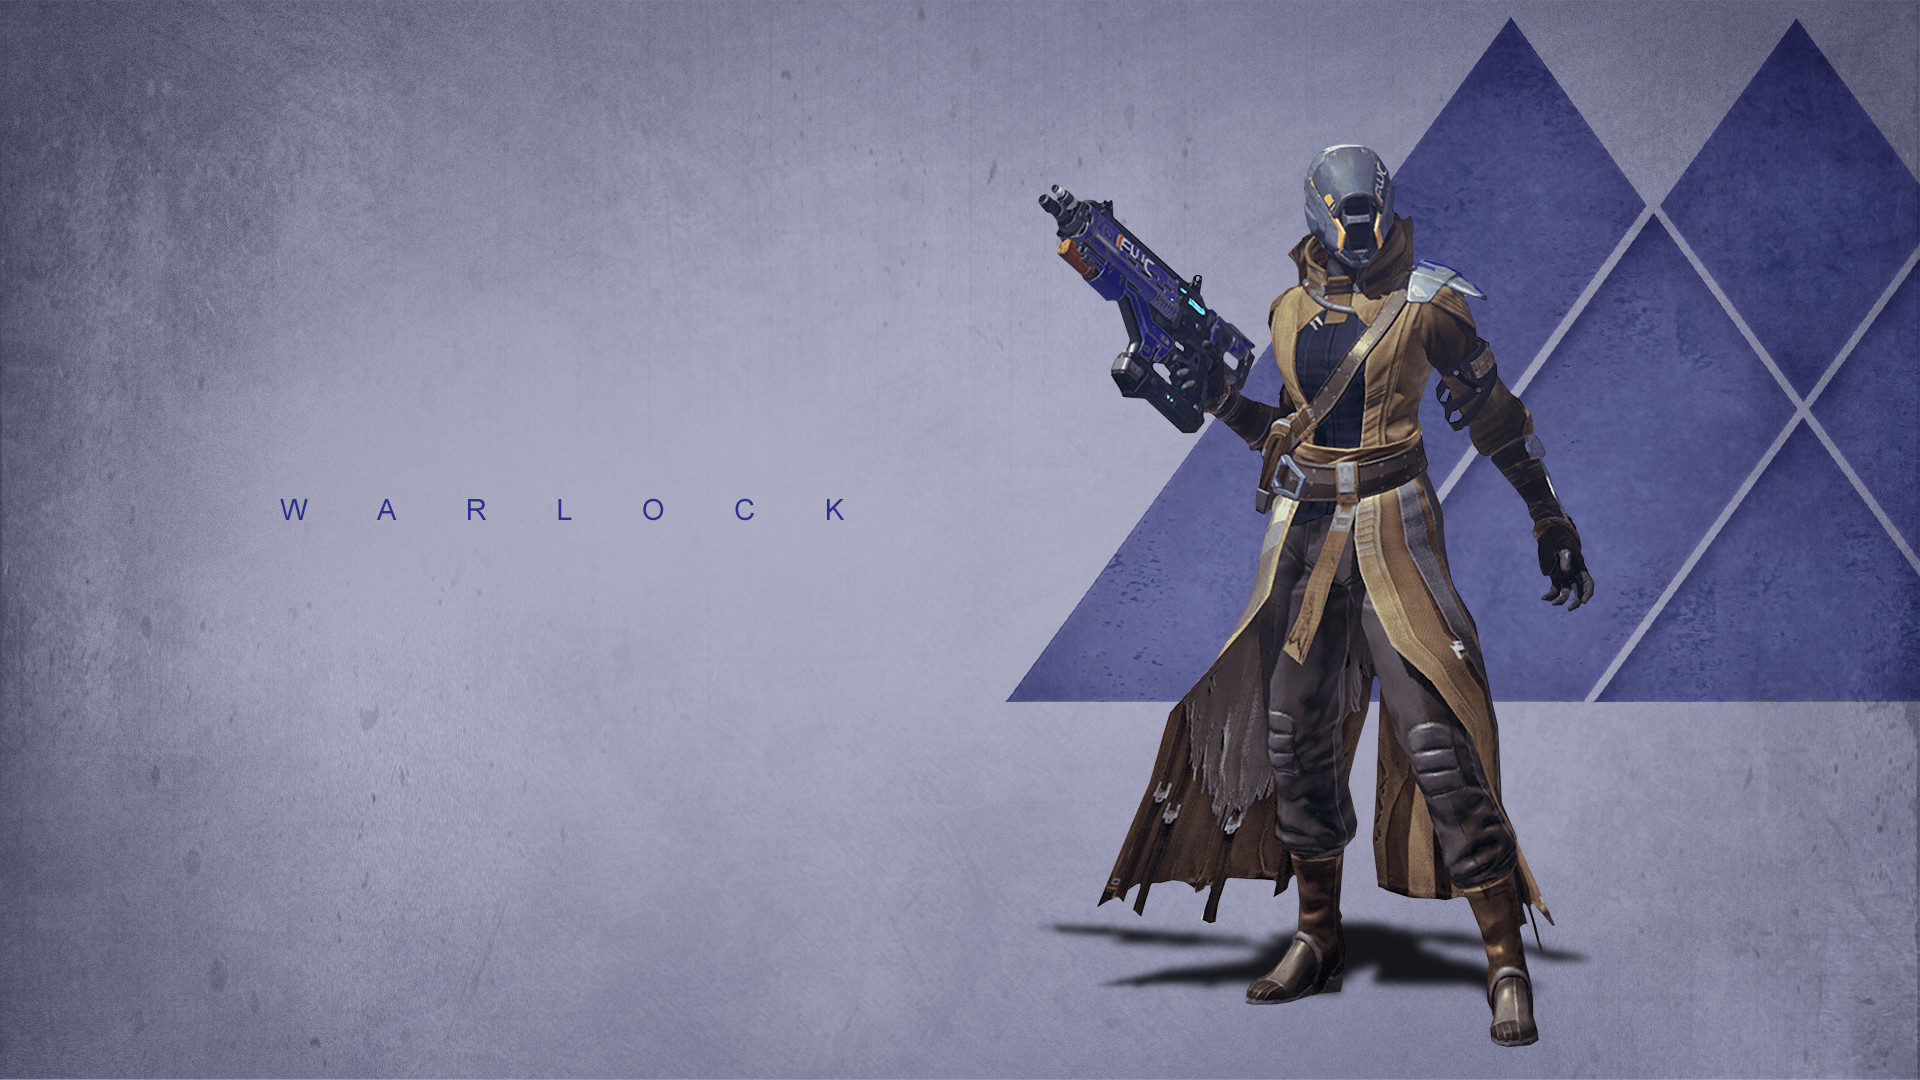 Destiny Warlock Wallpaper